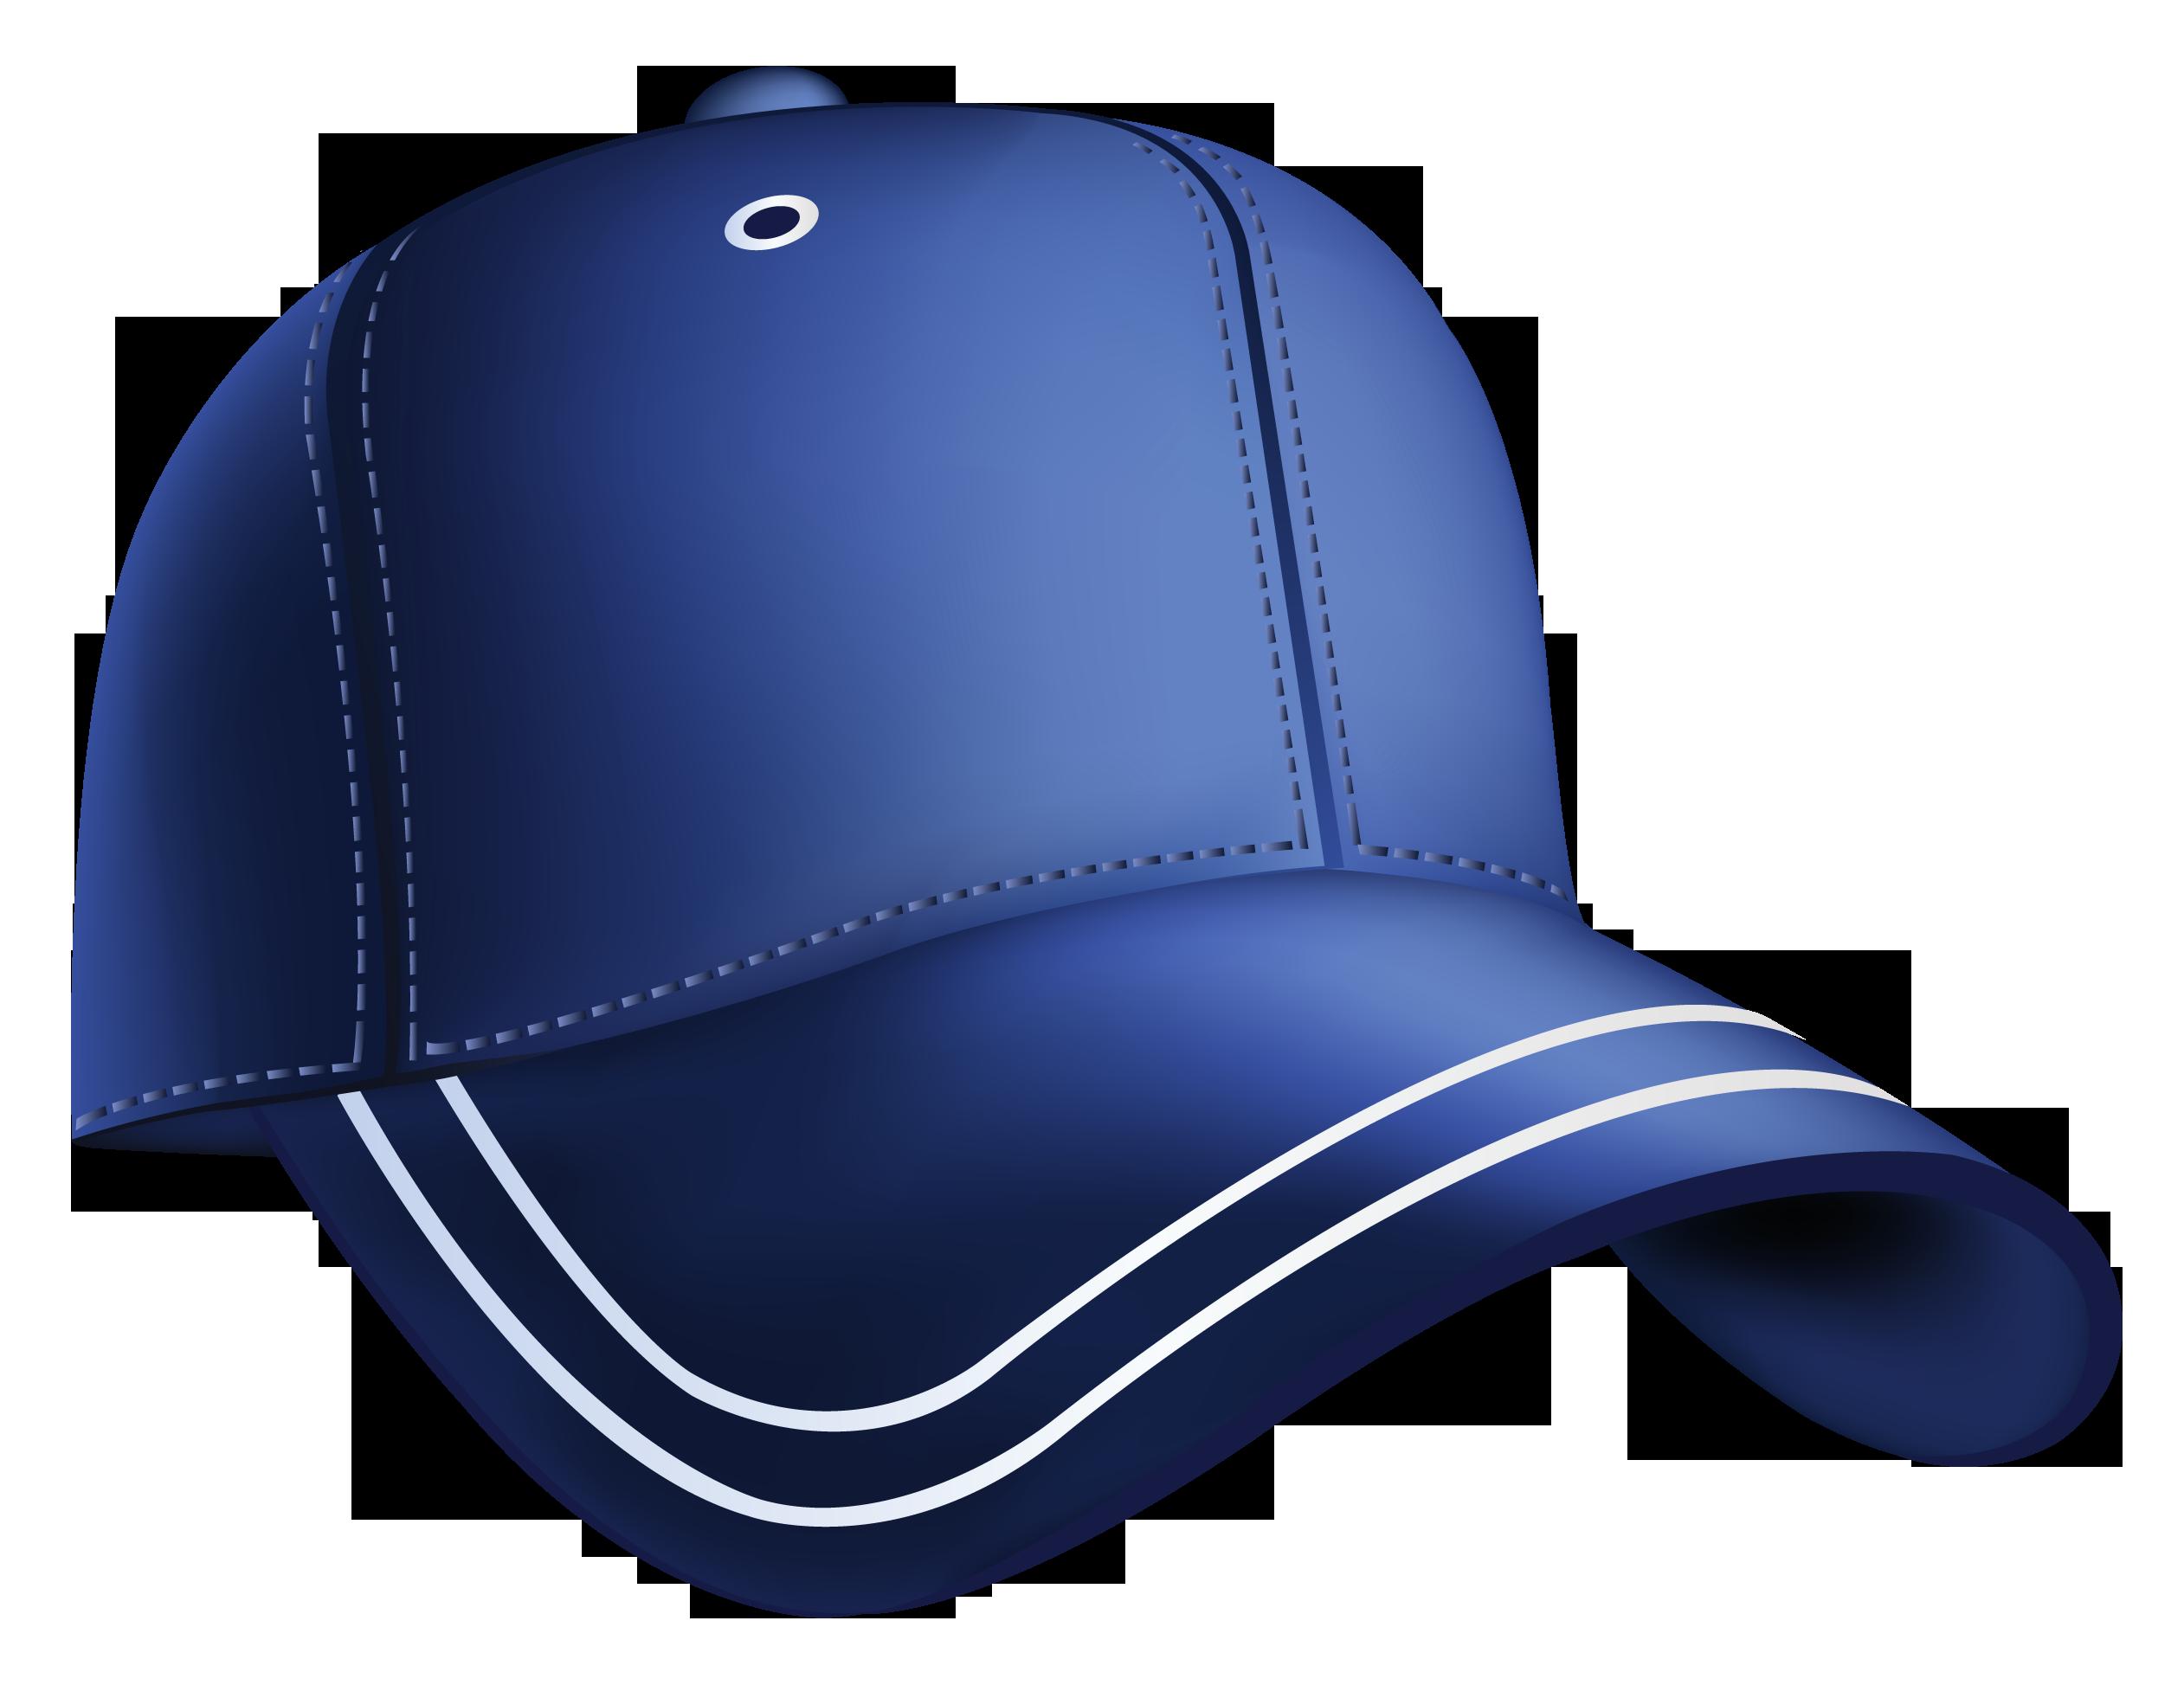 Baseball Cap Clipart.